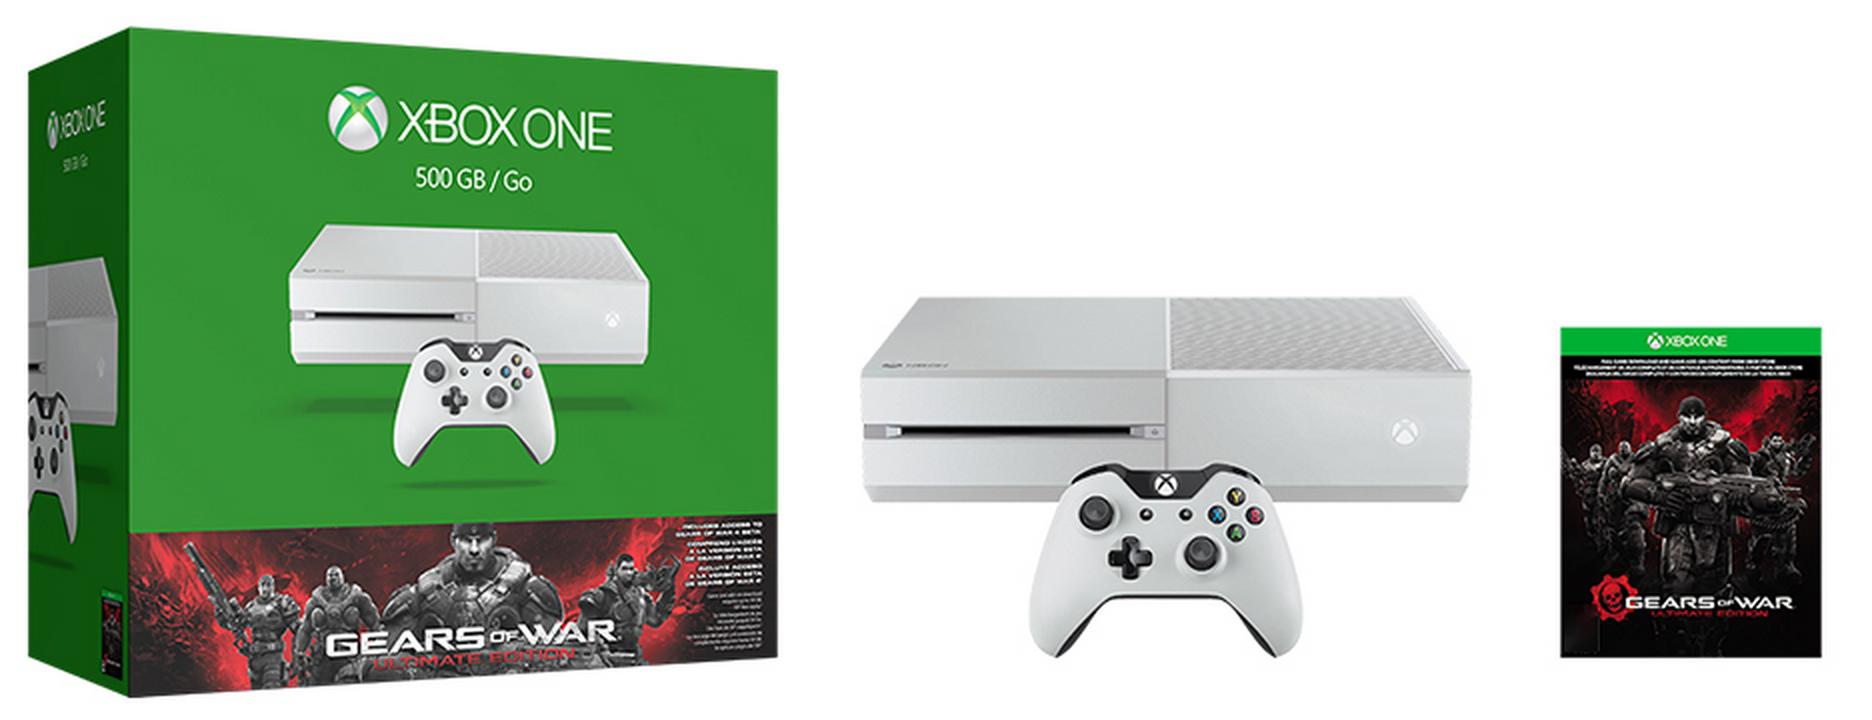 Best Xbox One Black Friday Deals | AllGamers